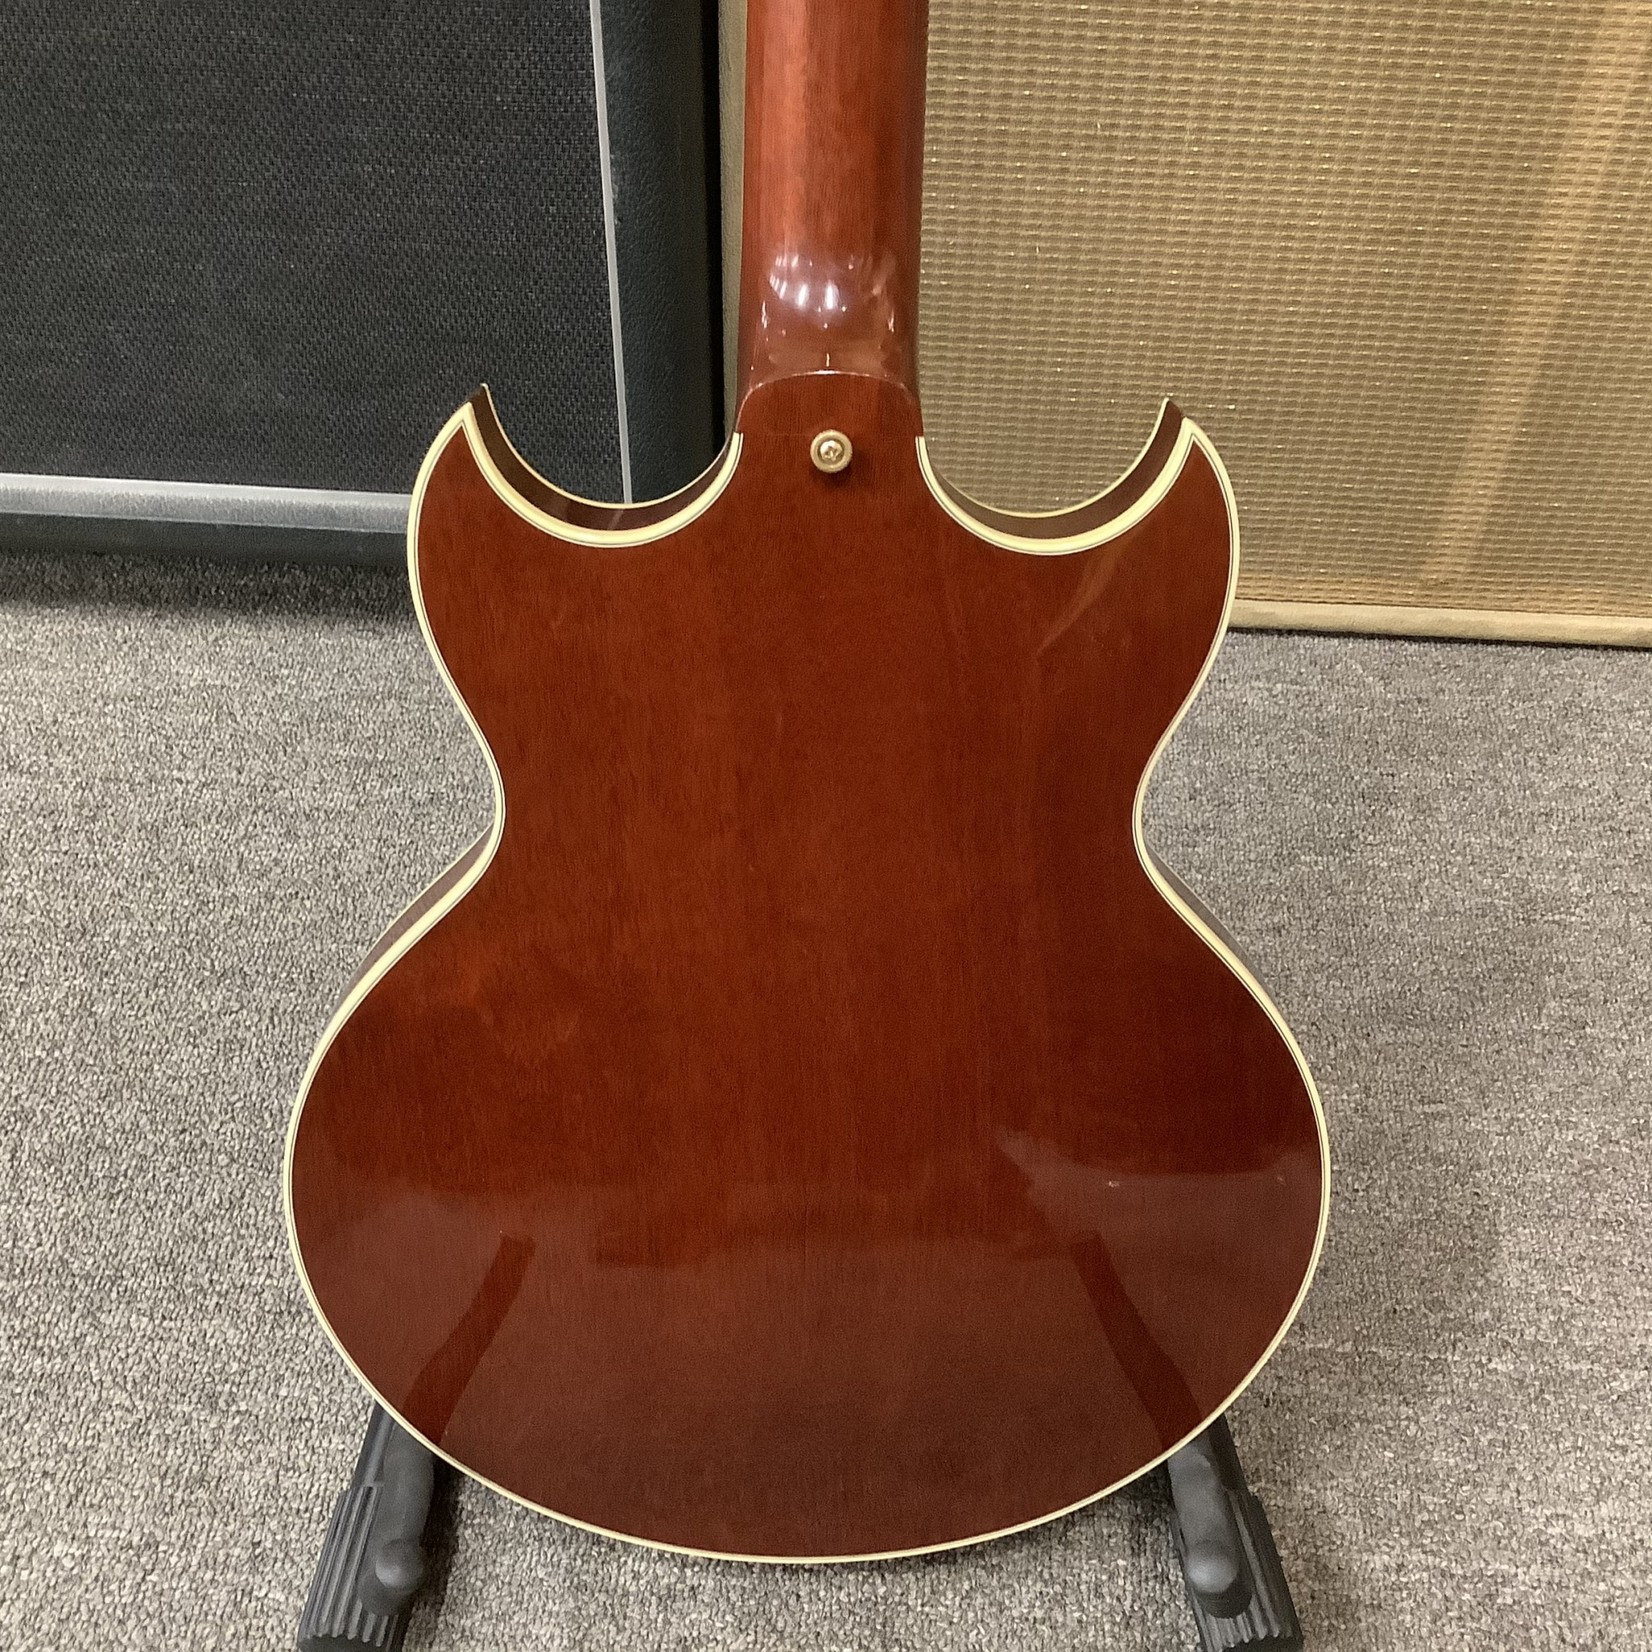 Gibson 2004 Gibson Johnny A. Signature Guitar w/Bigsby Tailpiece, Sunburst JA 526